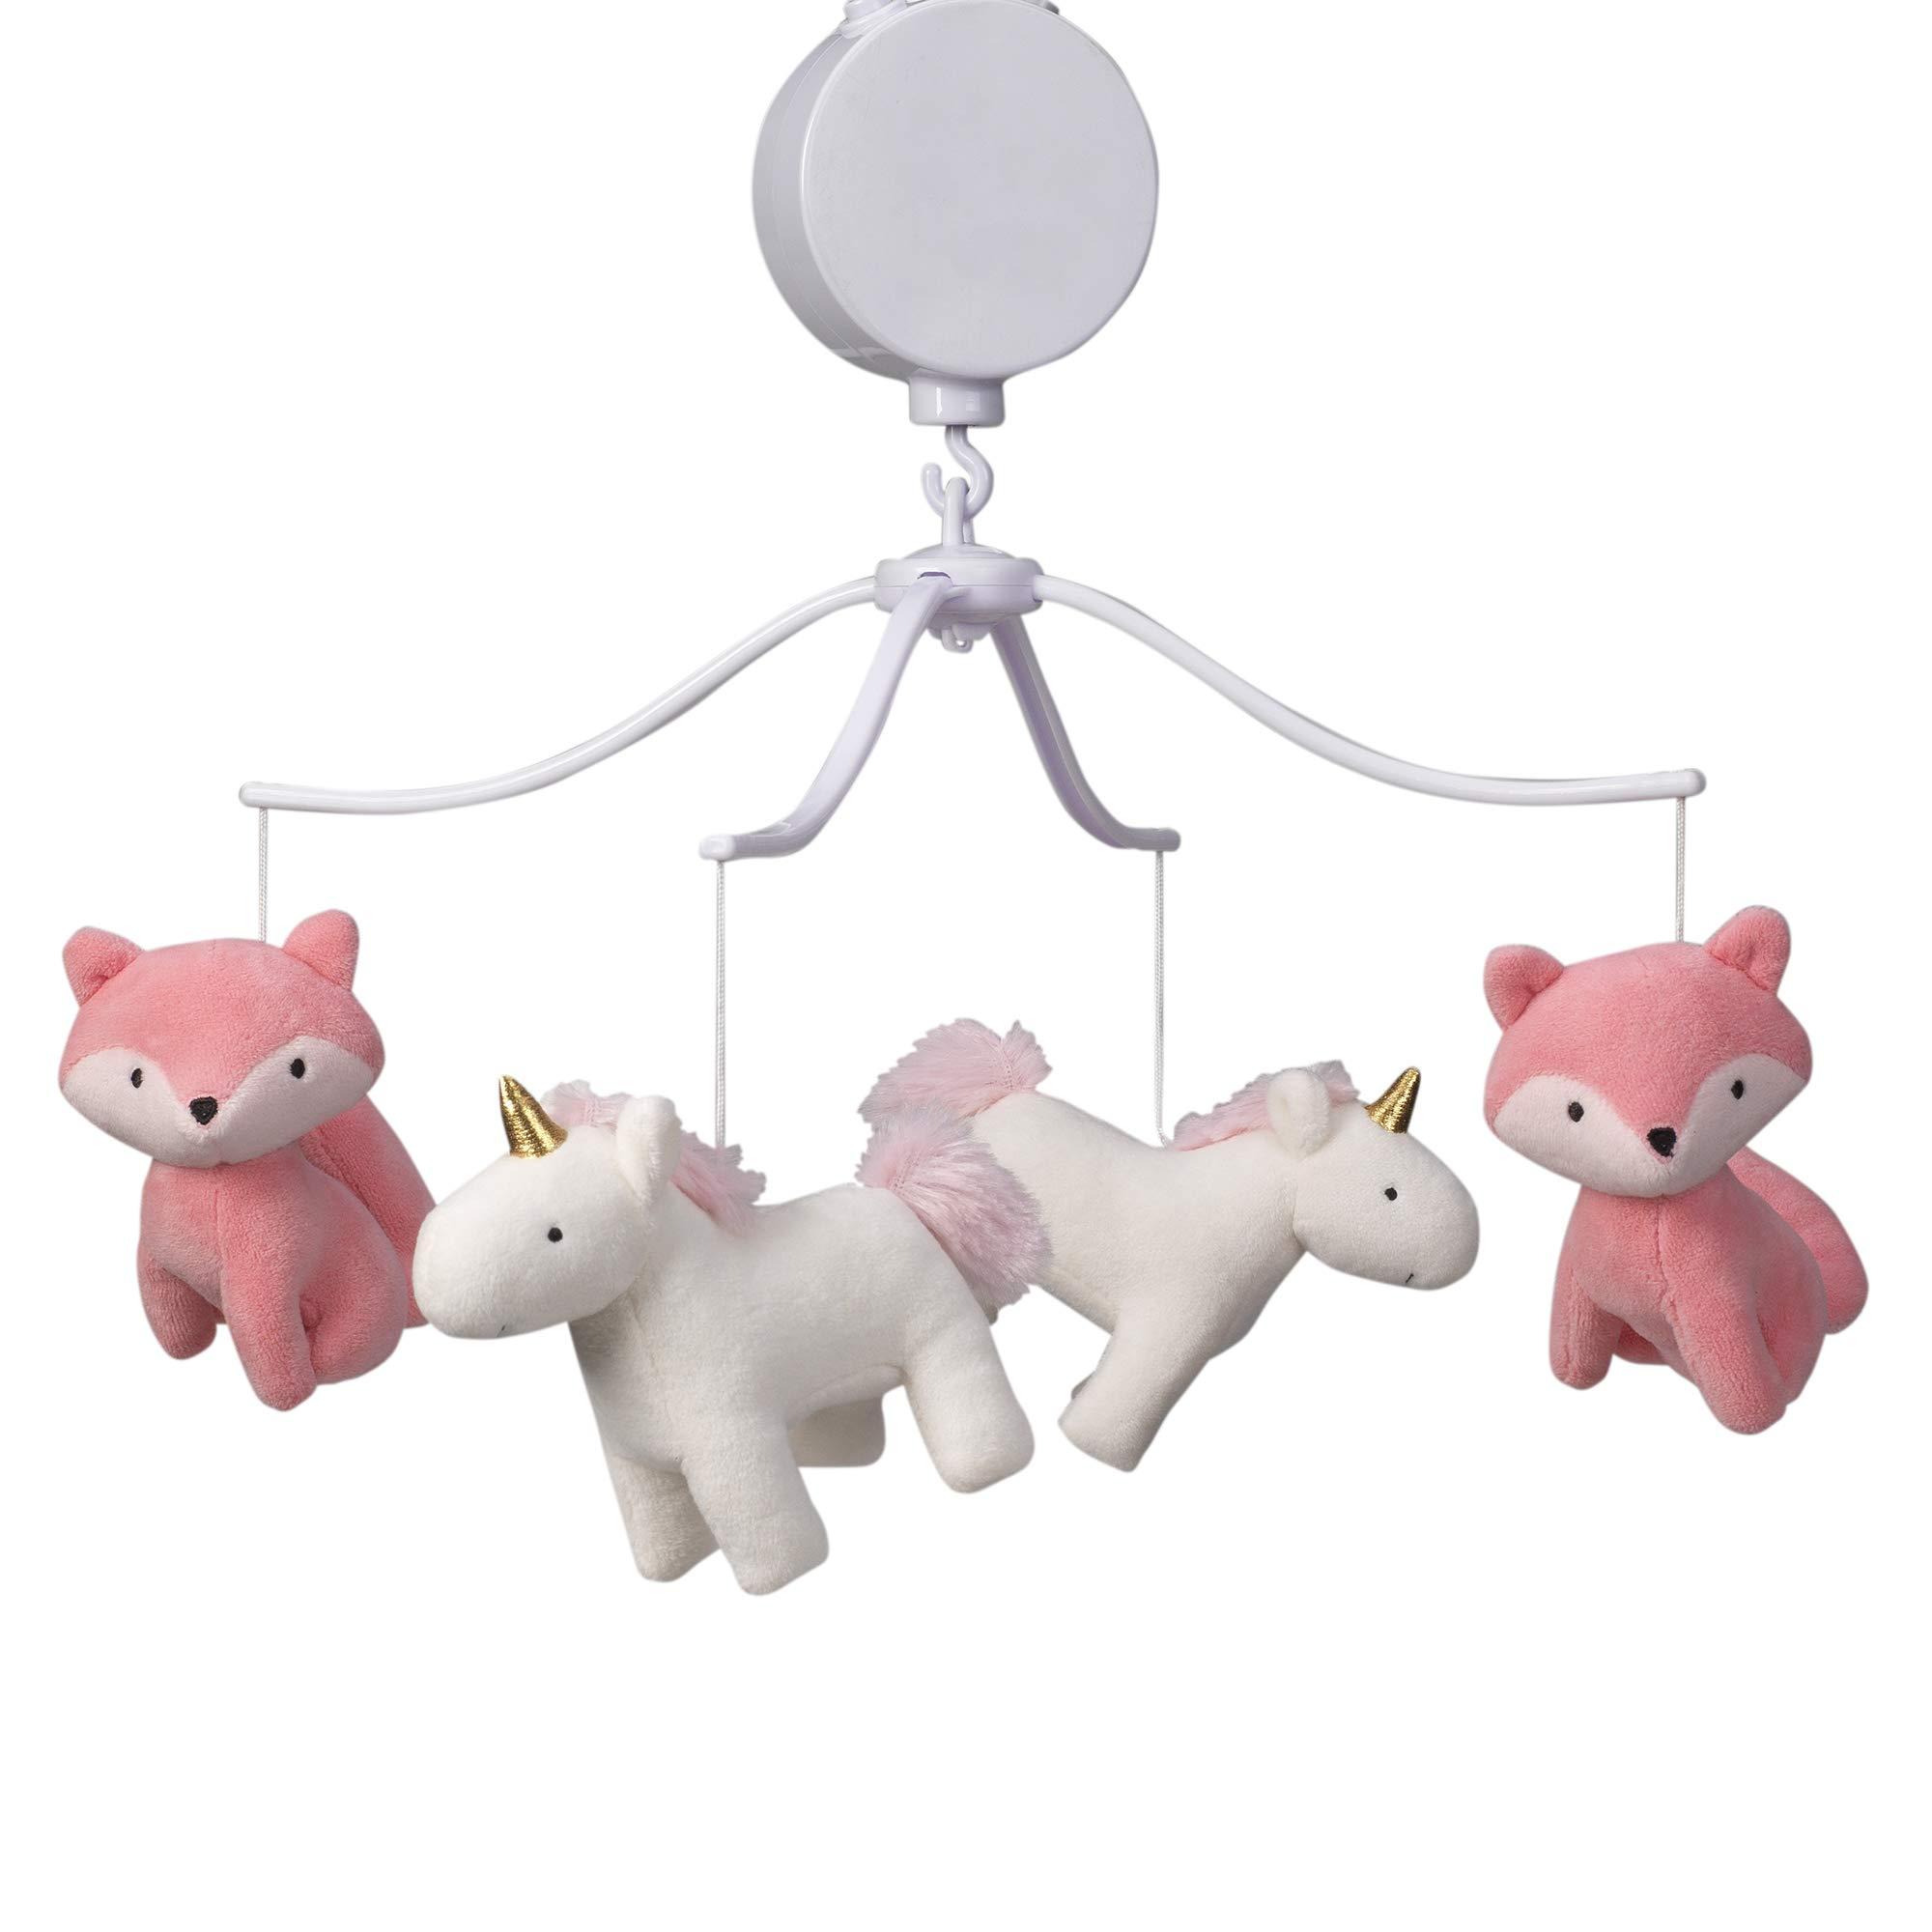 Bedtime Originals Rainbow Unicorn Musical Baby Crib Mobile, Pink by Bedtime Originals